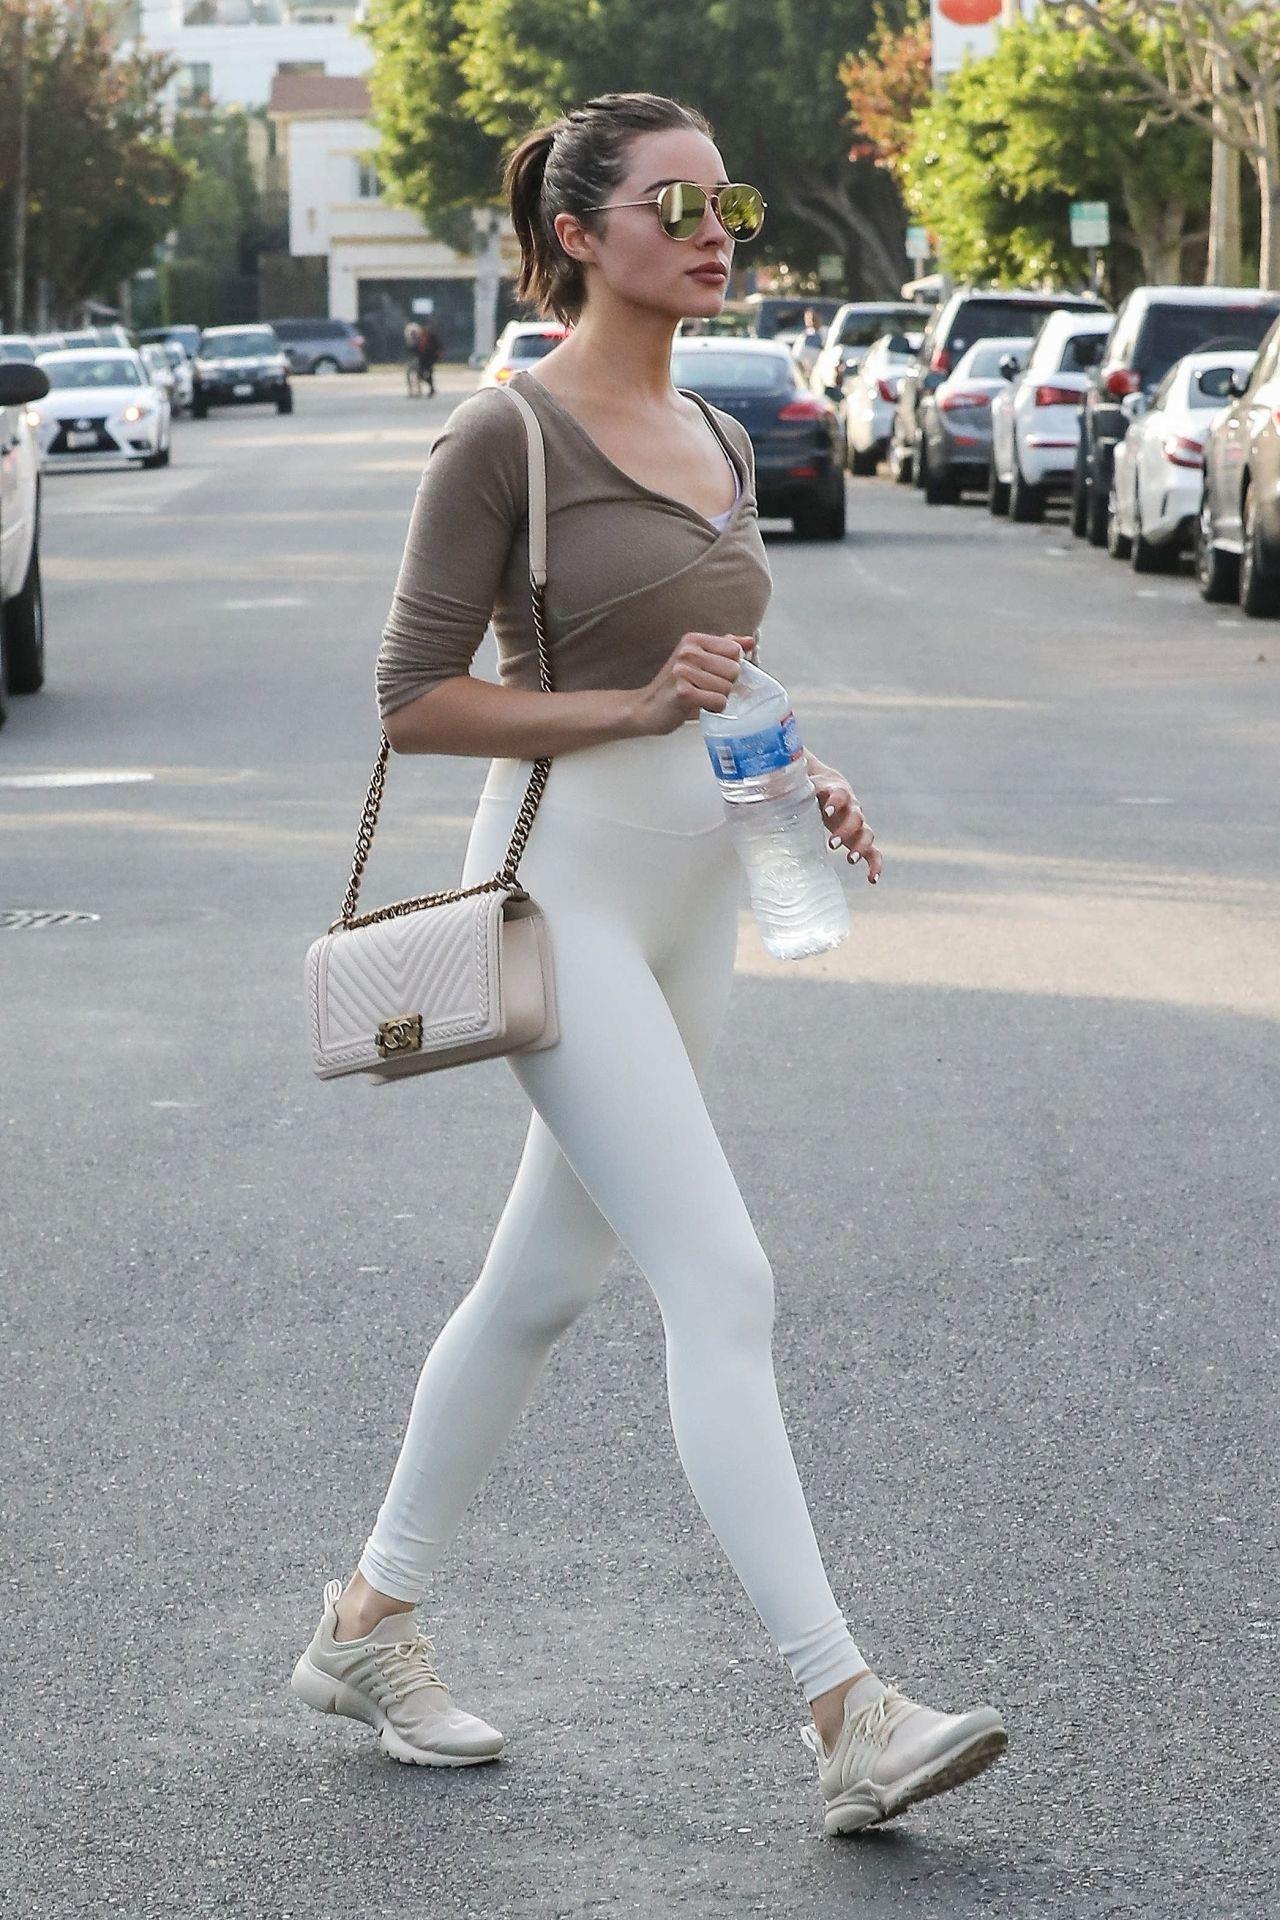 Olivia Culpo in a Small Top and Skin Tight Leggings